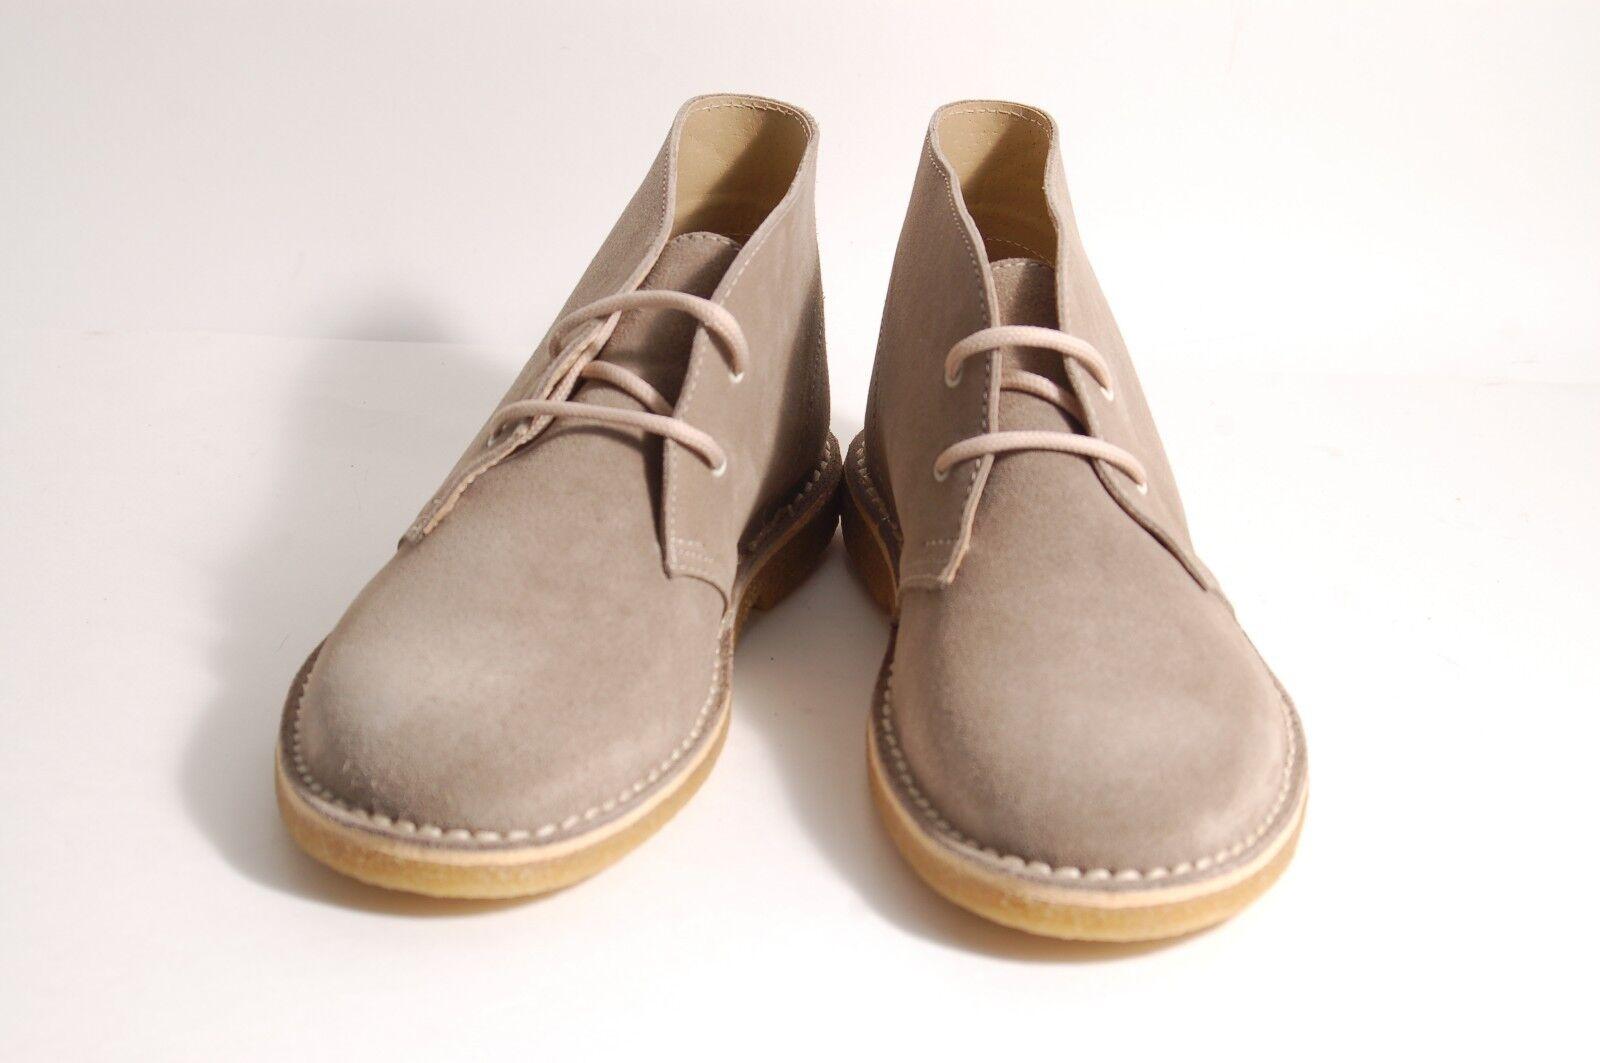 Zapatos-antica Calzoleria campana-semi alta Boots | serraje | 500n